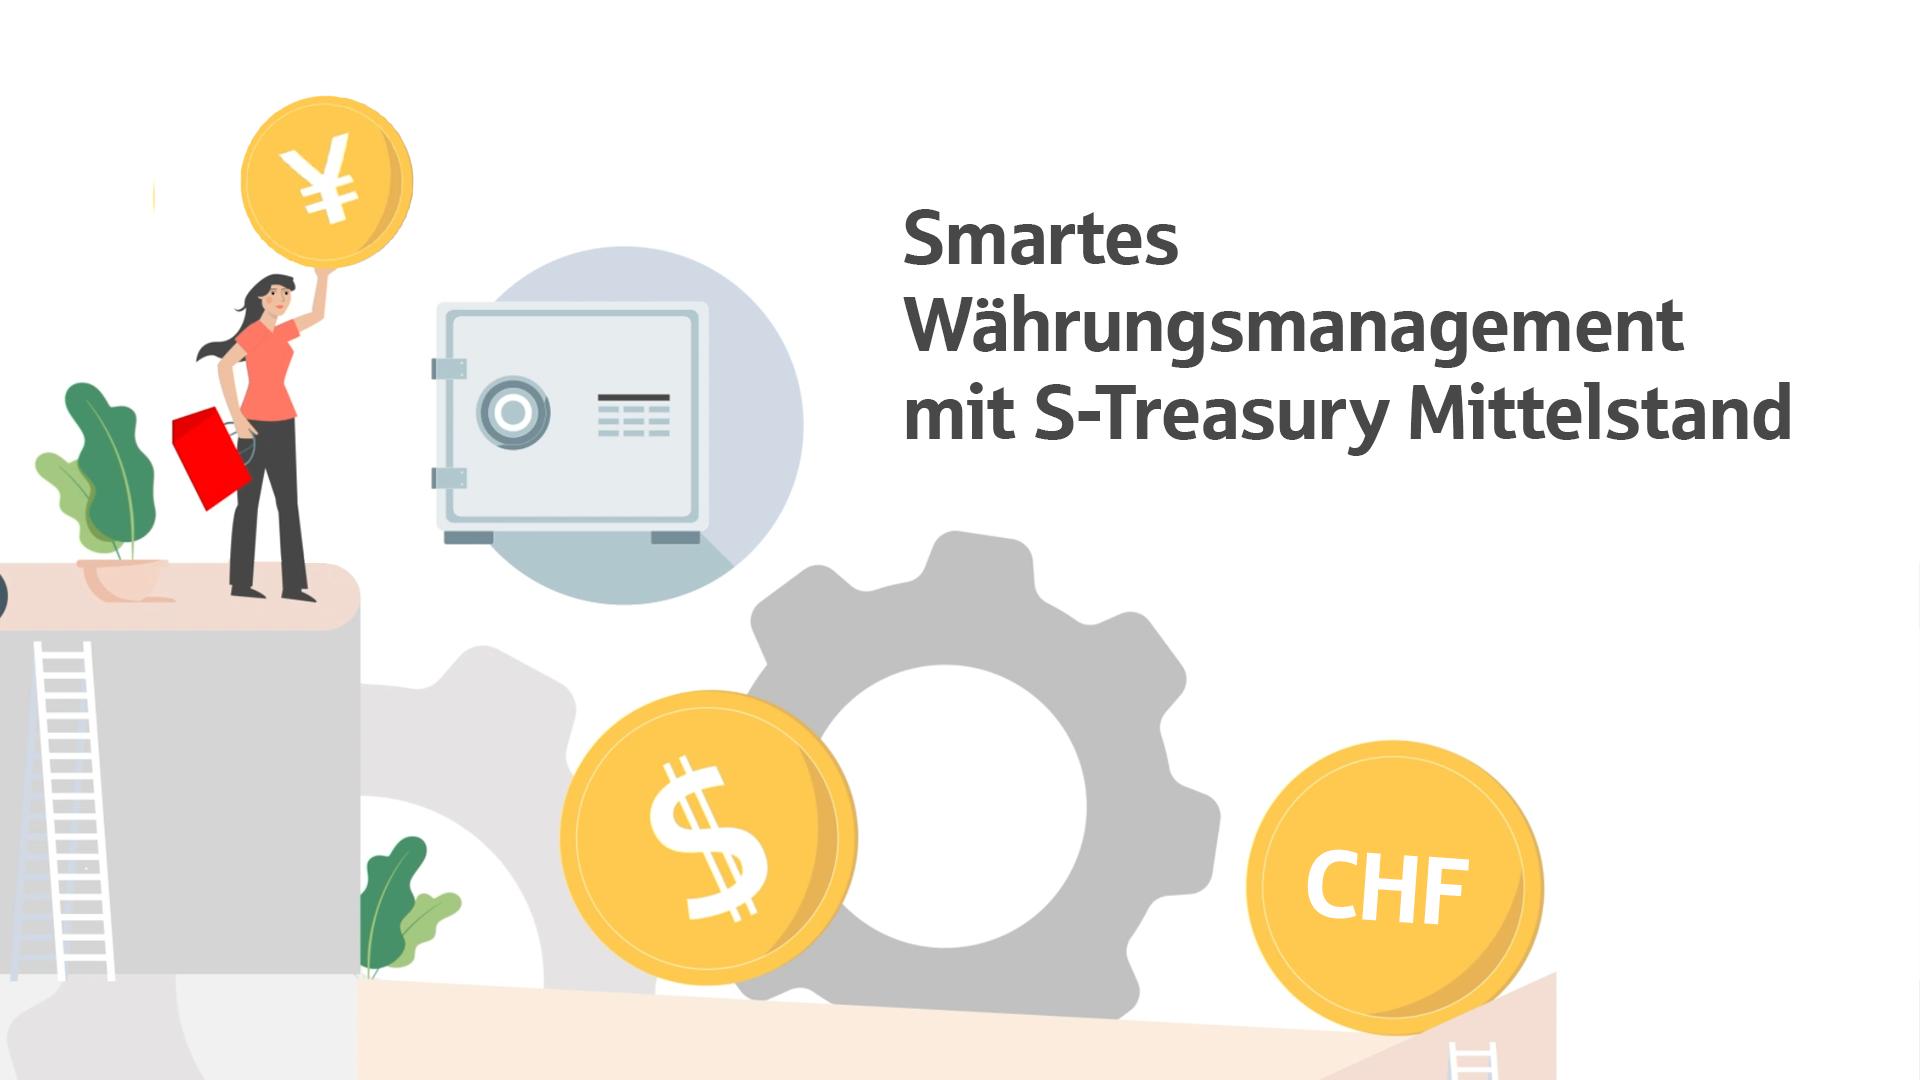 S-Treasury Mittelstand